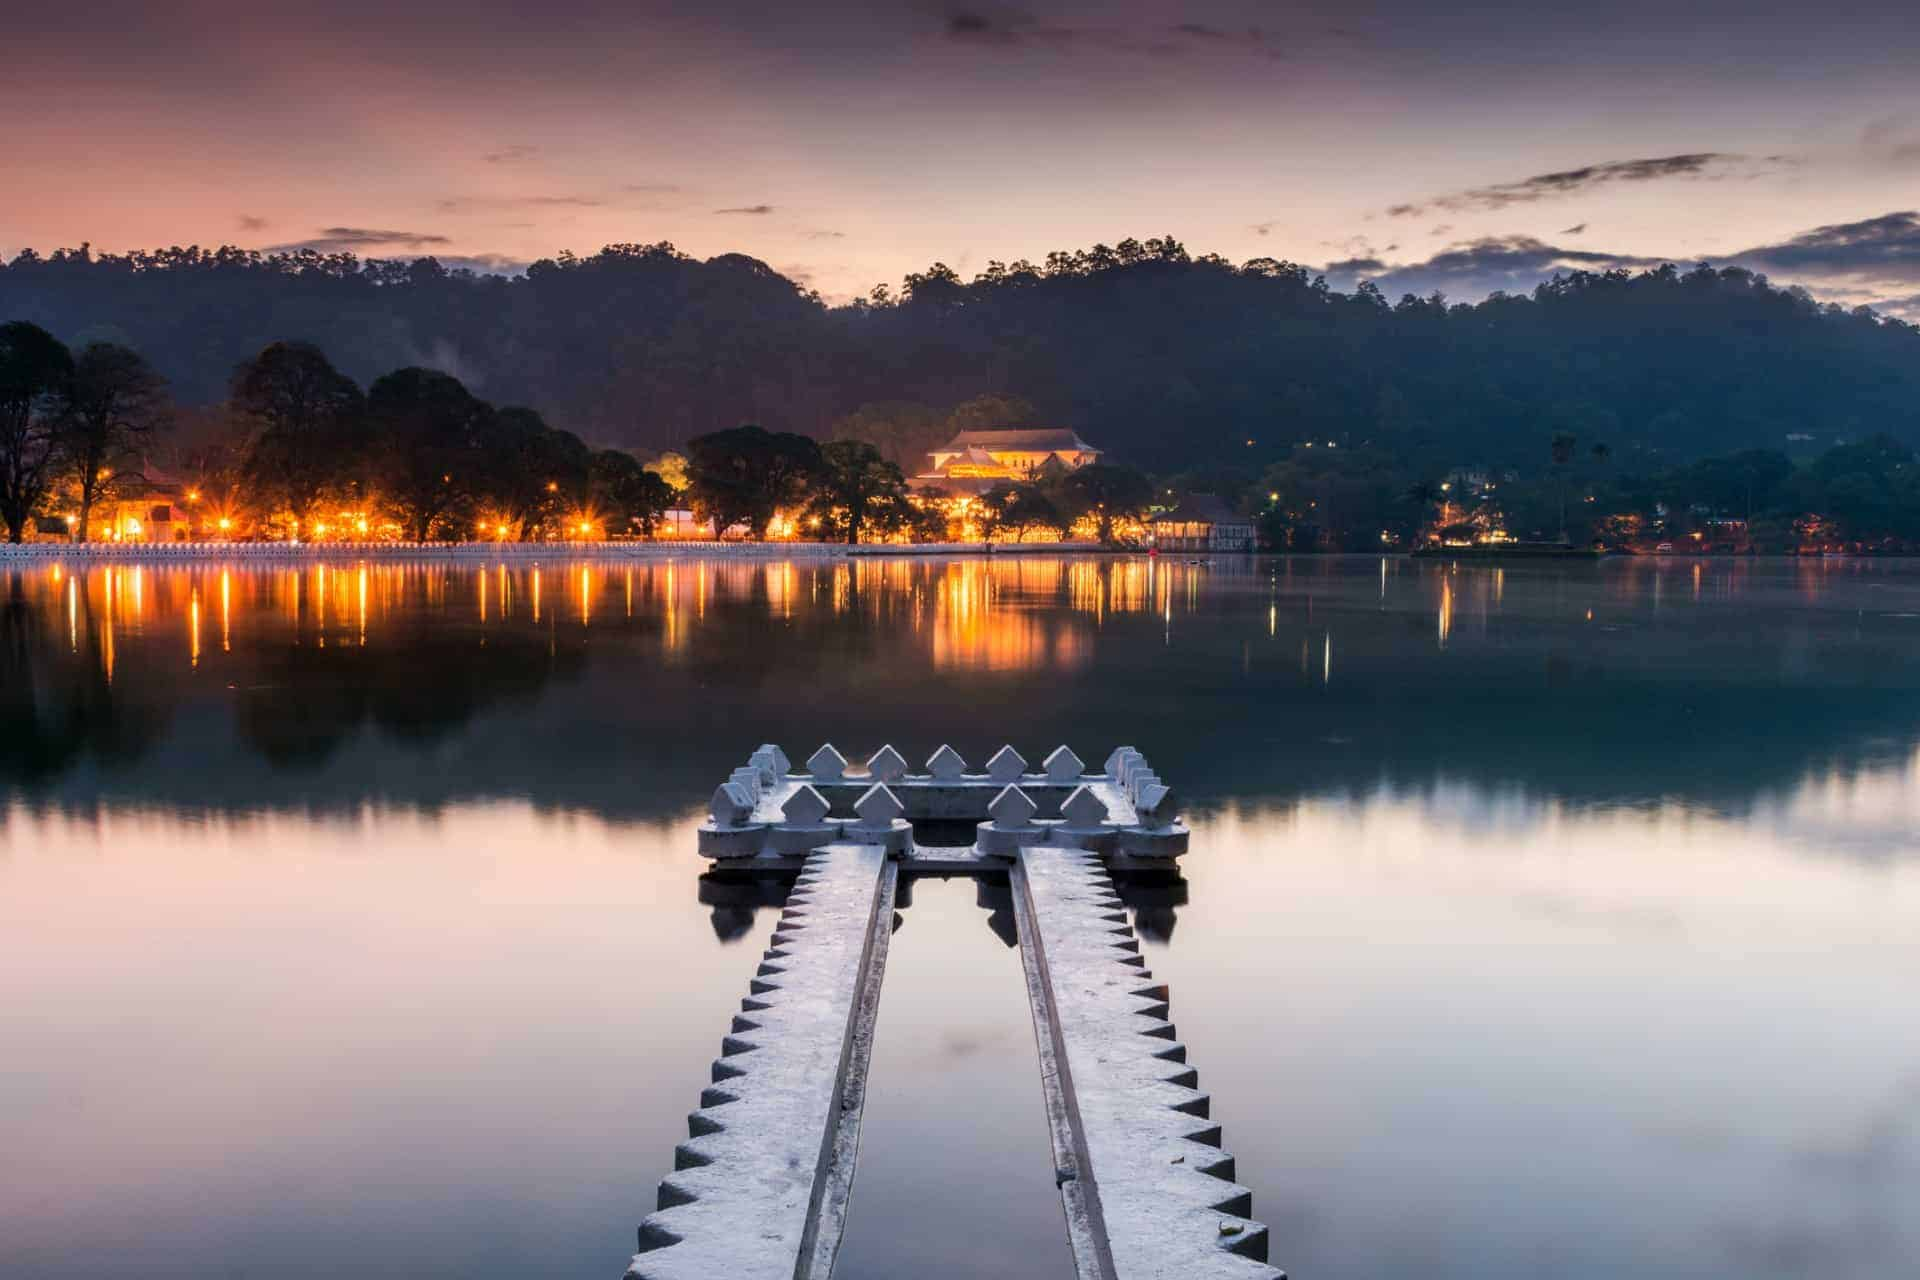 Kandy Lake and the Temple of the Sacred Tooth Relic (Sri Dalada Maligawa) at sunrise, Kandy, Sri Lanka